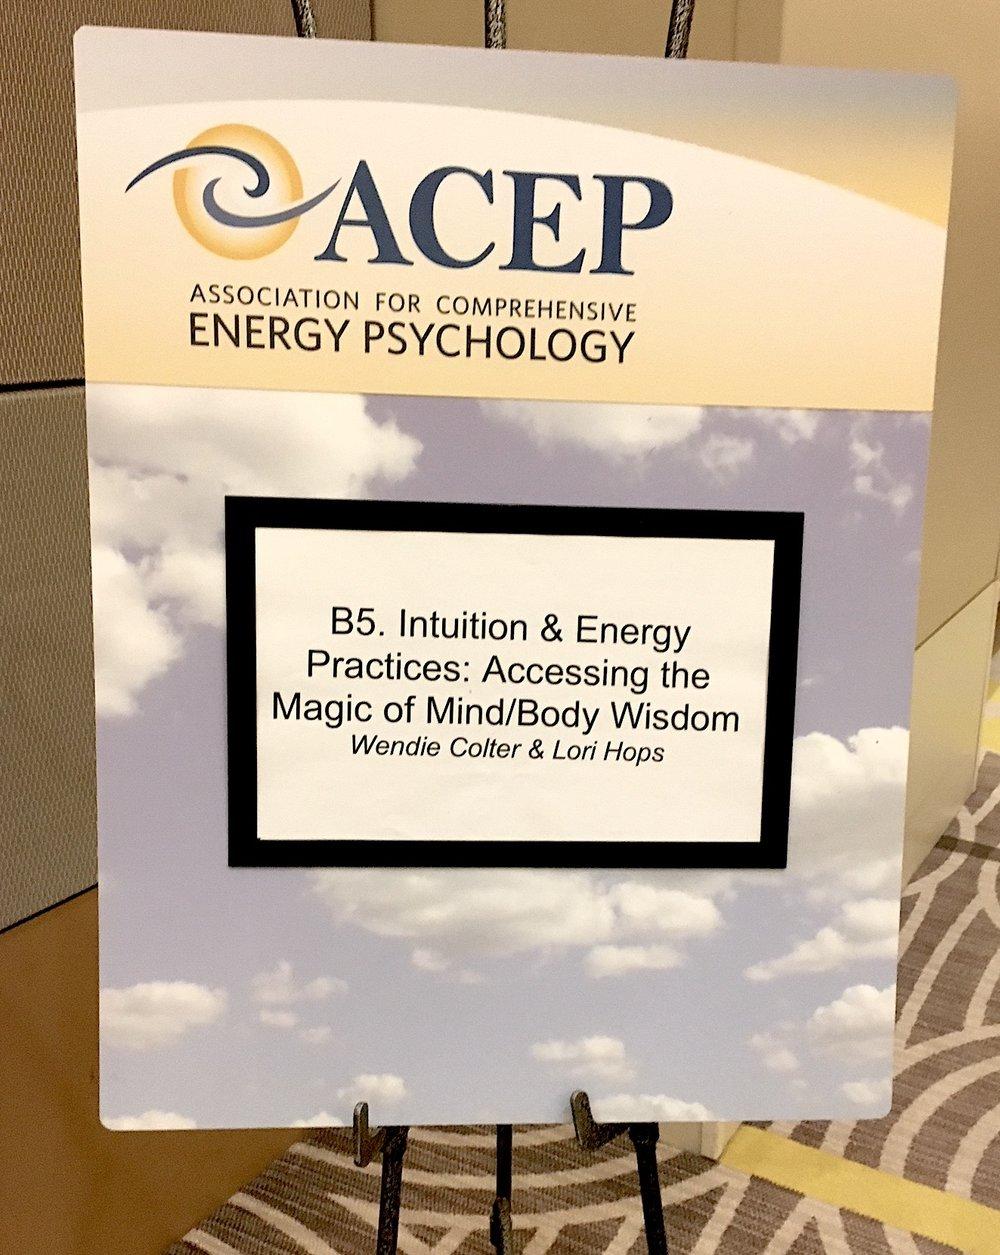 ACEP Conference 2018, Orlando, FL